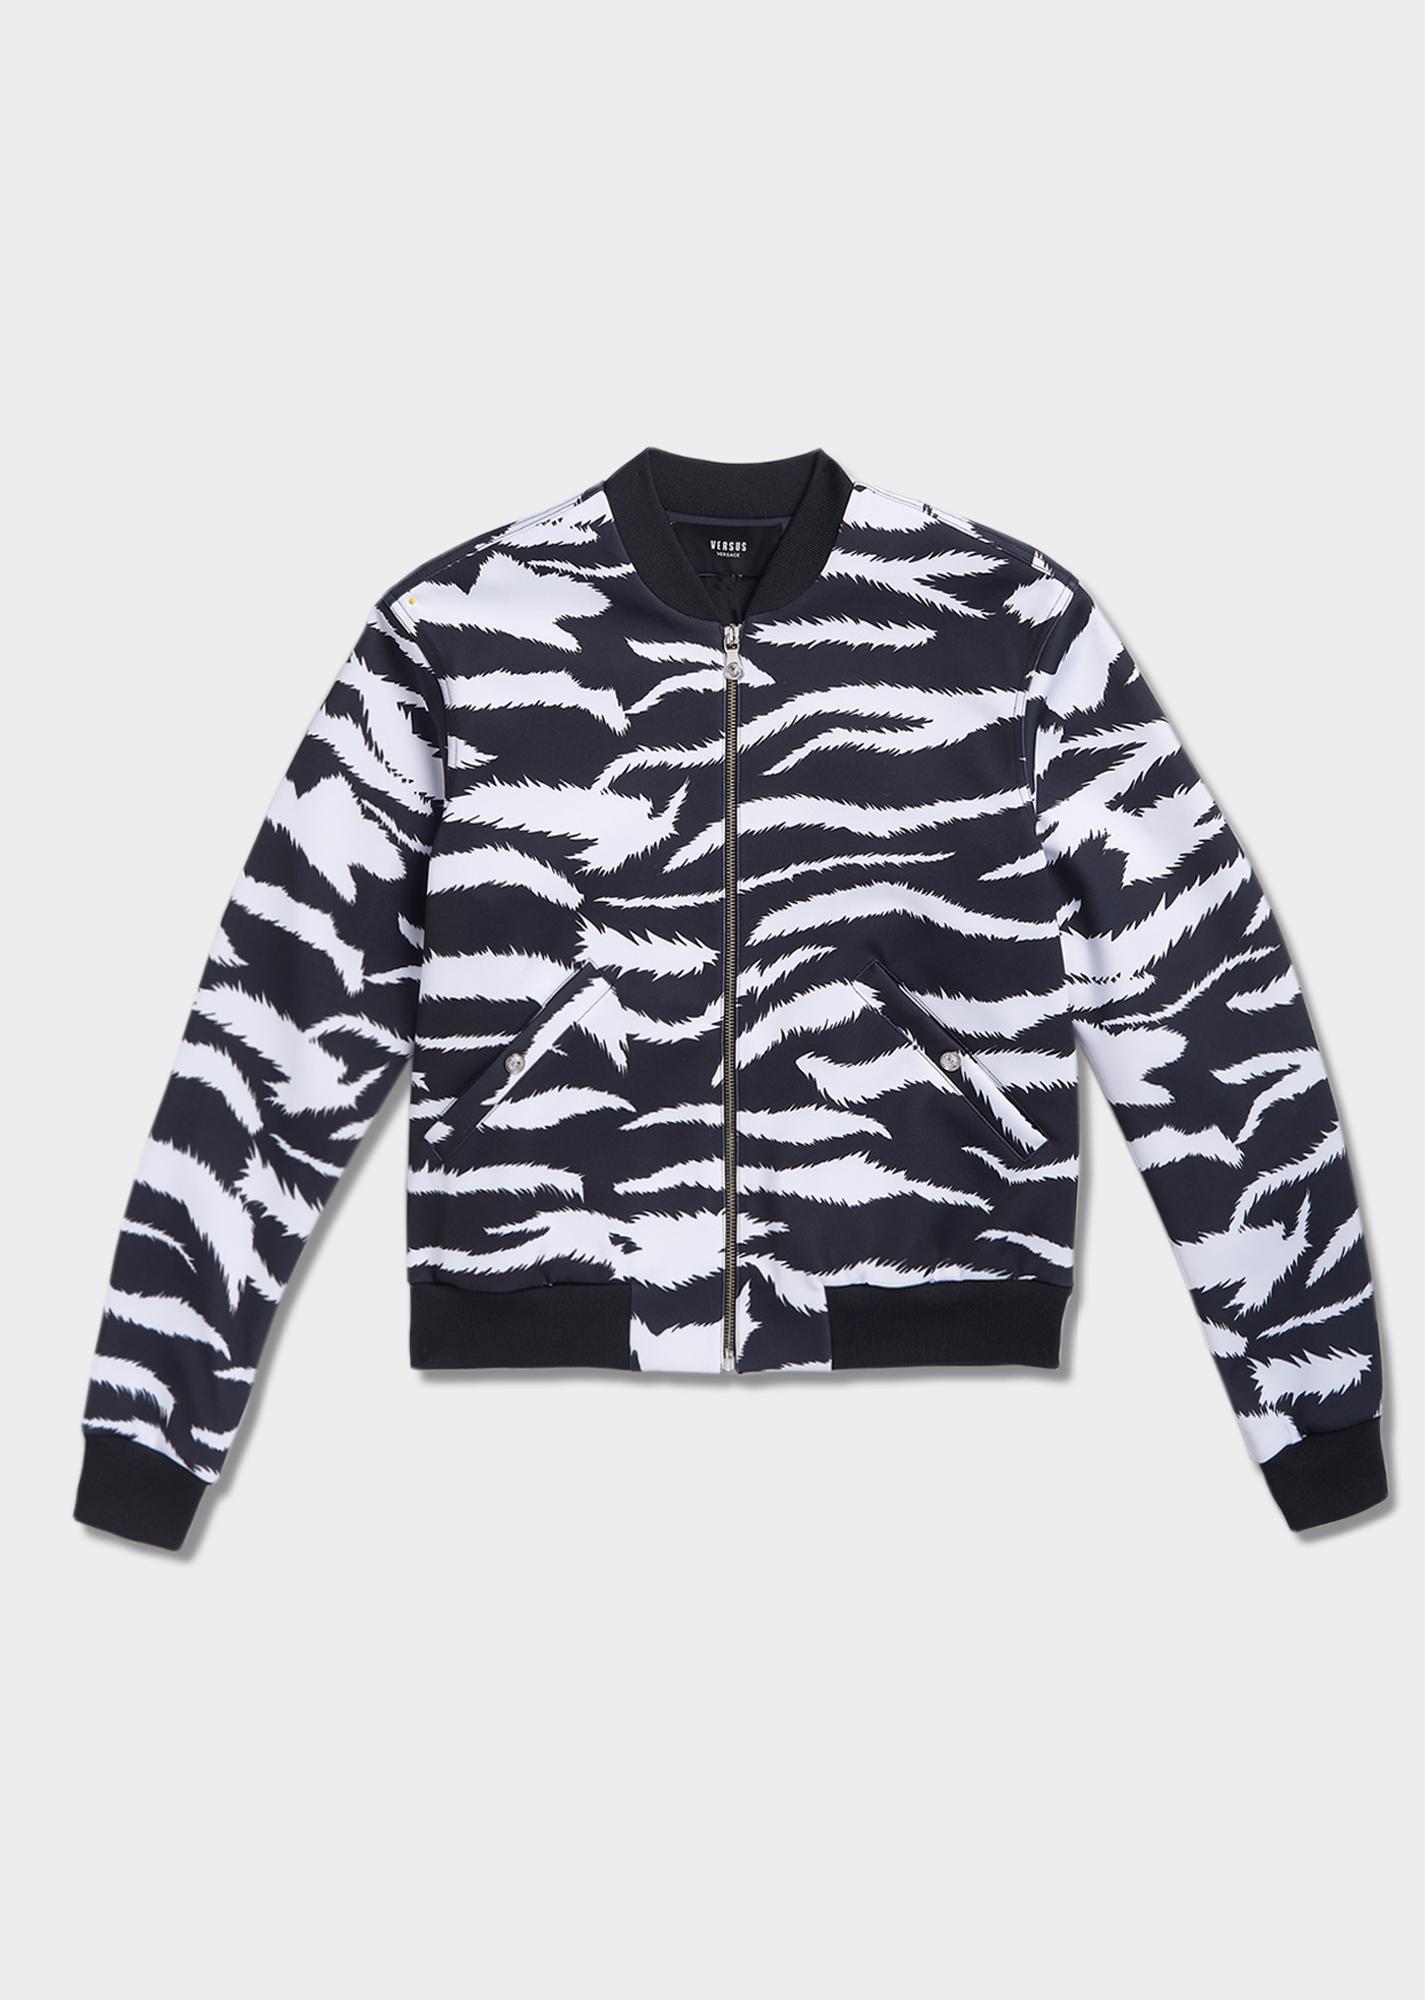 312a8b2489 Versus Versace Zebra Print Bomber Jacket 295 EUR. | My Style ...